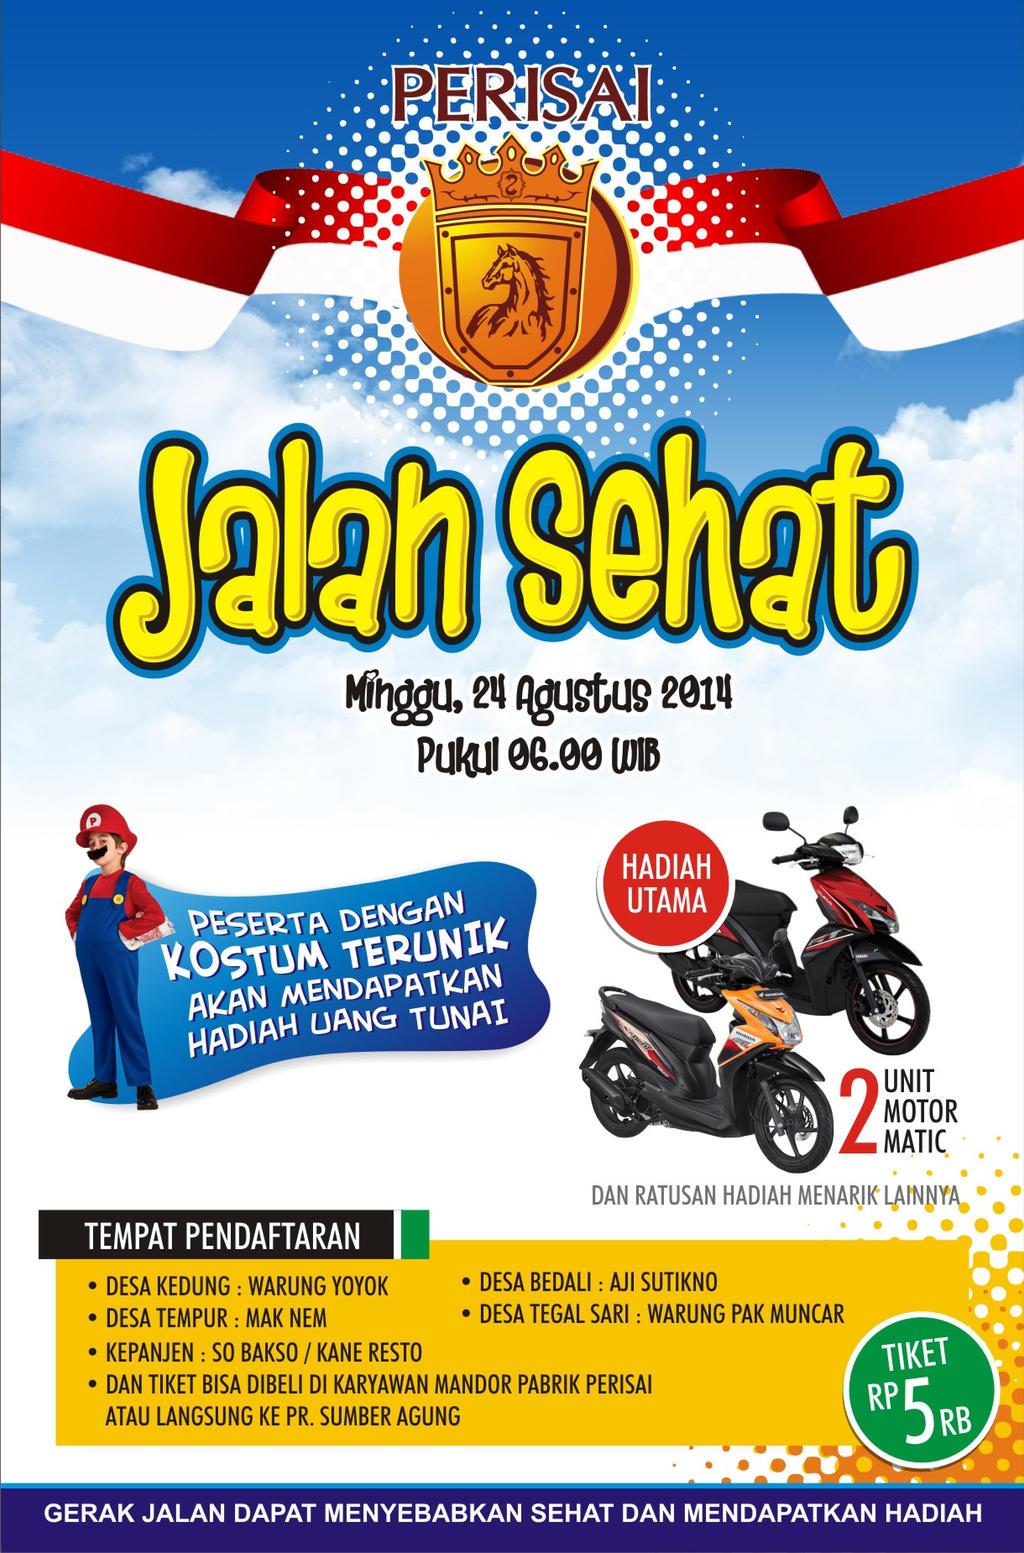 Contoh Layout Poster Jalan Sehat By Onikabstrak On Deviantart